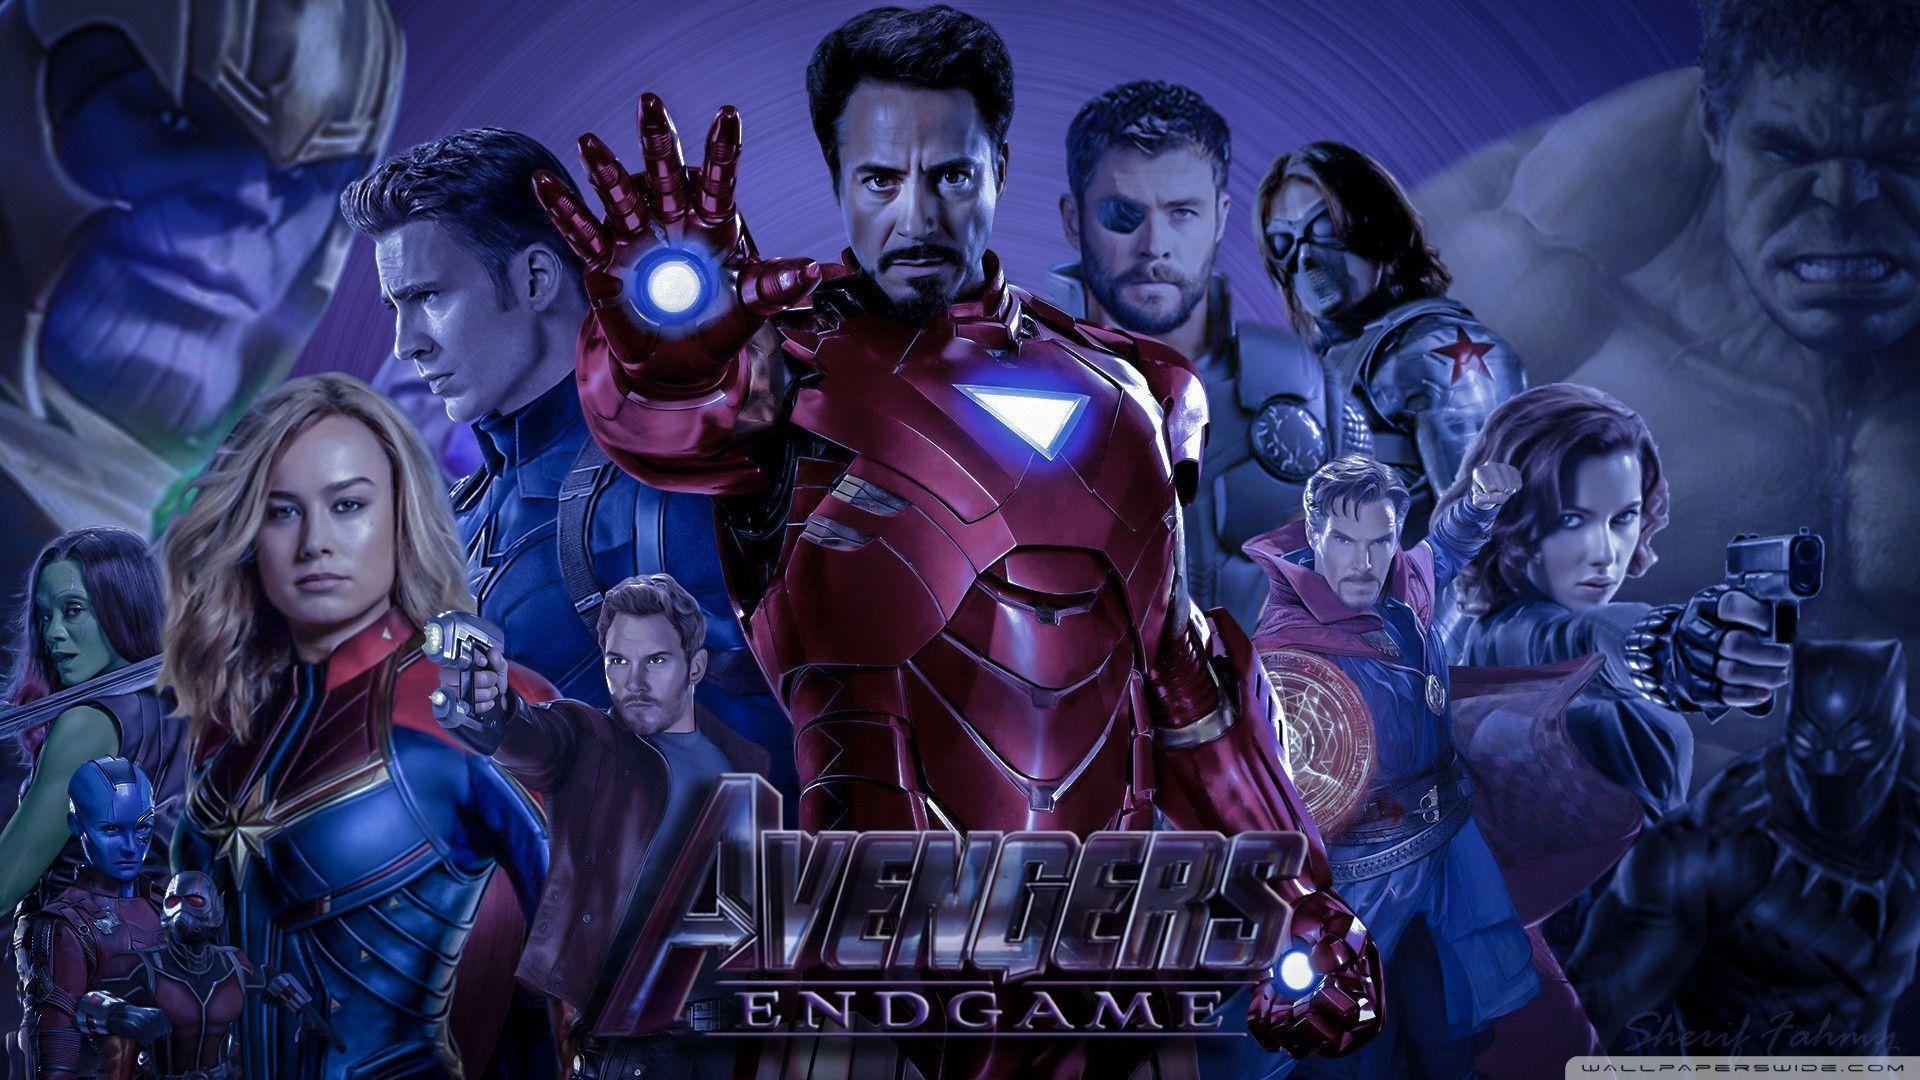 Awesome Avengers Endgame 4k Hd Desktop Wallpaper For 4k Ultra Hd Tv 4k Ultra Hd Tvs Ultra Hd Tvs Hd Desktop